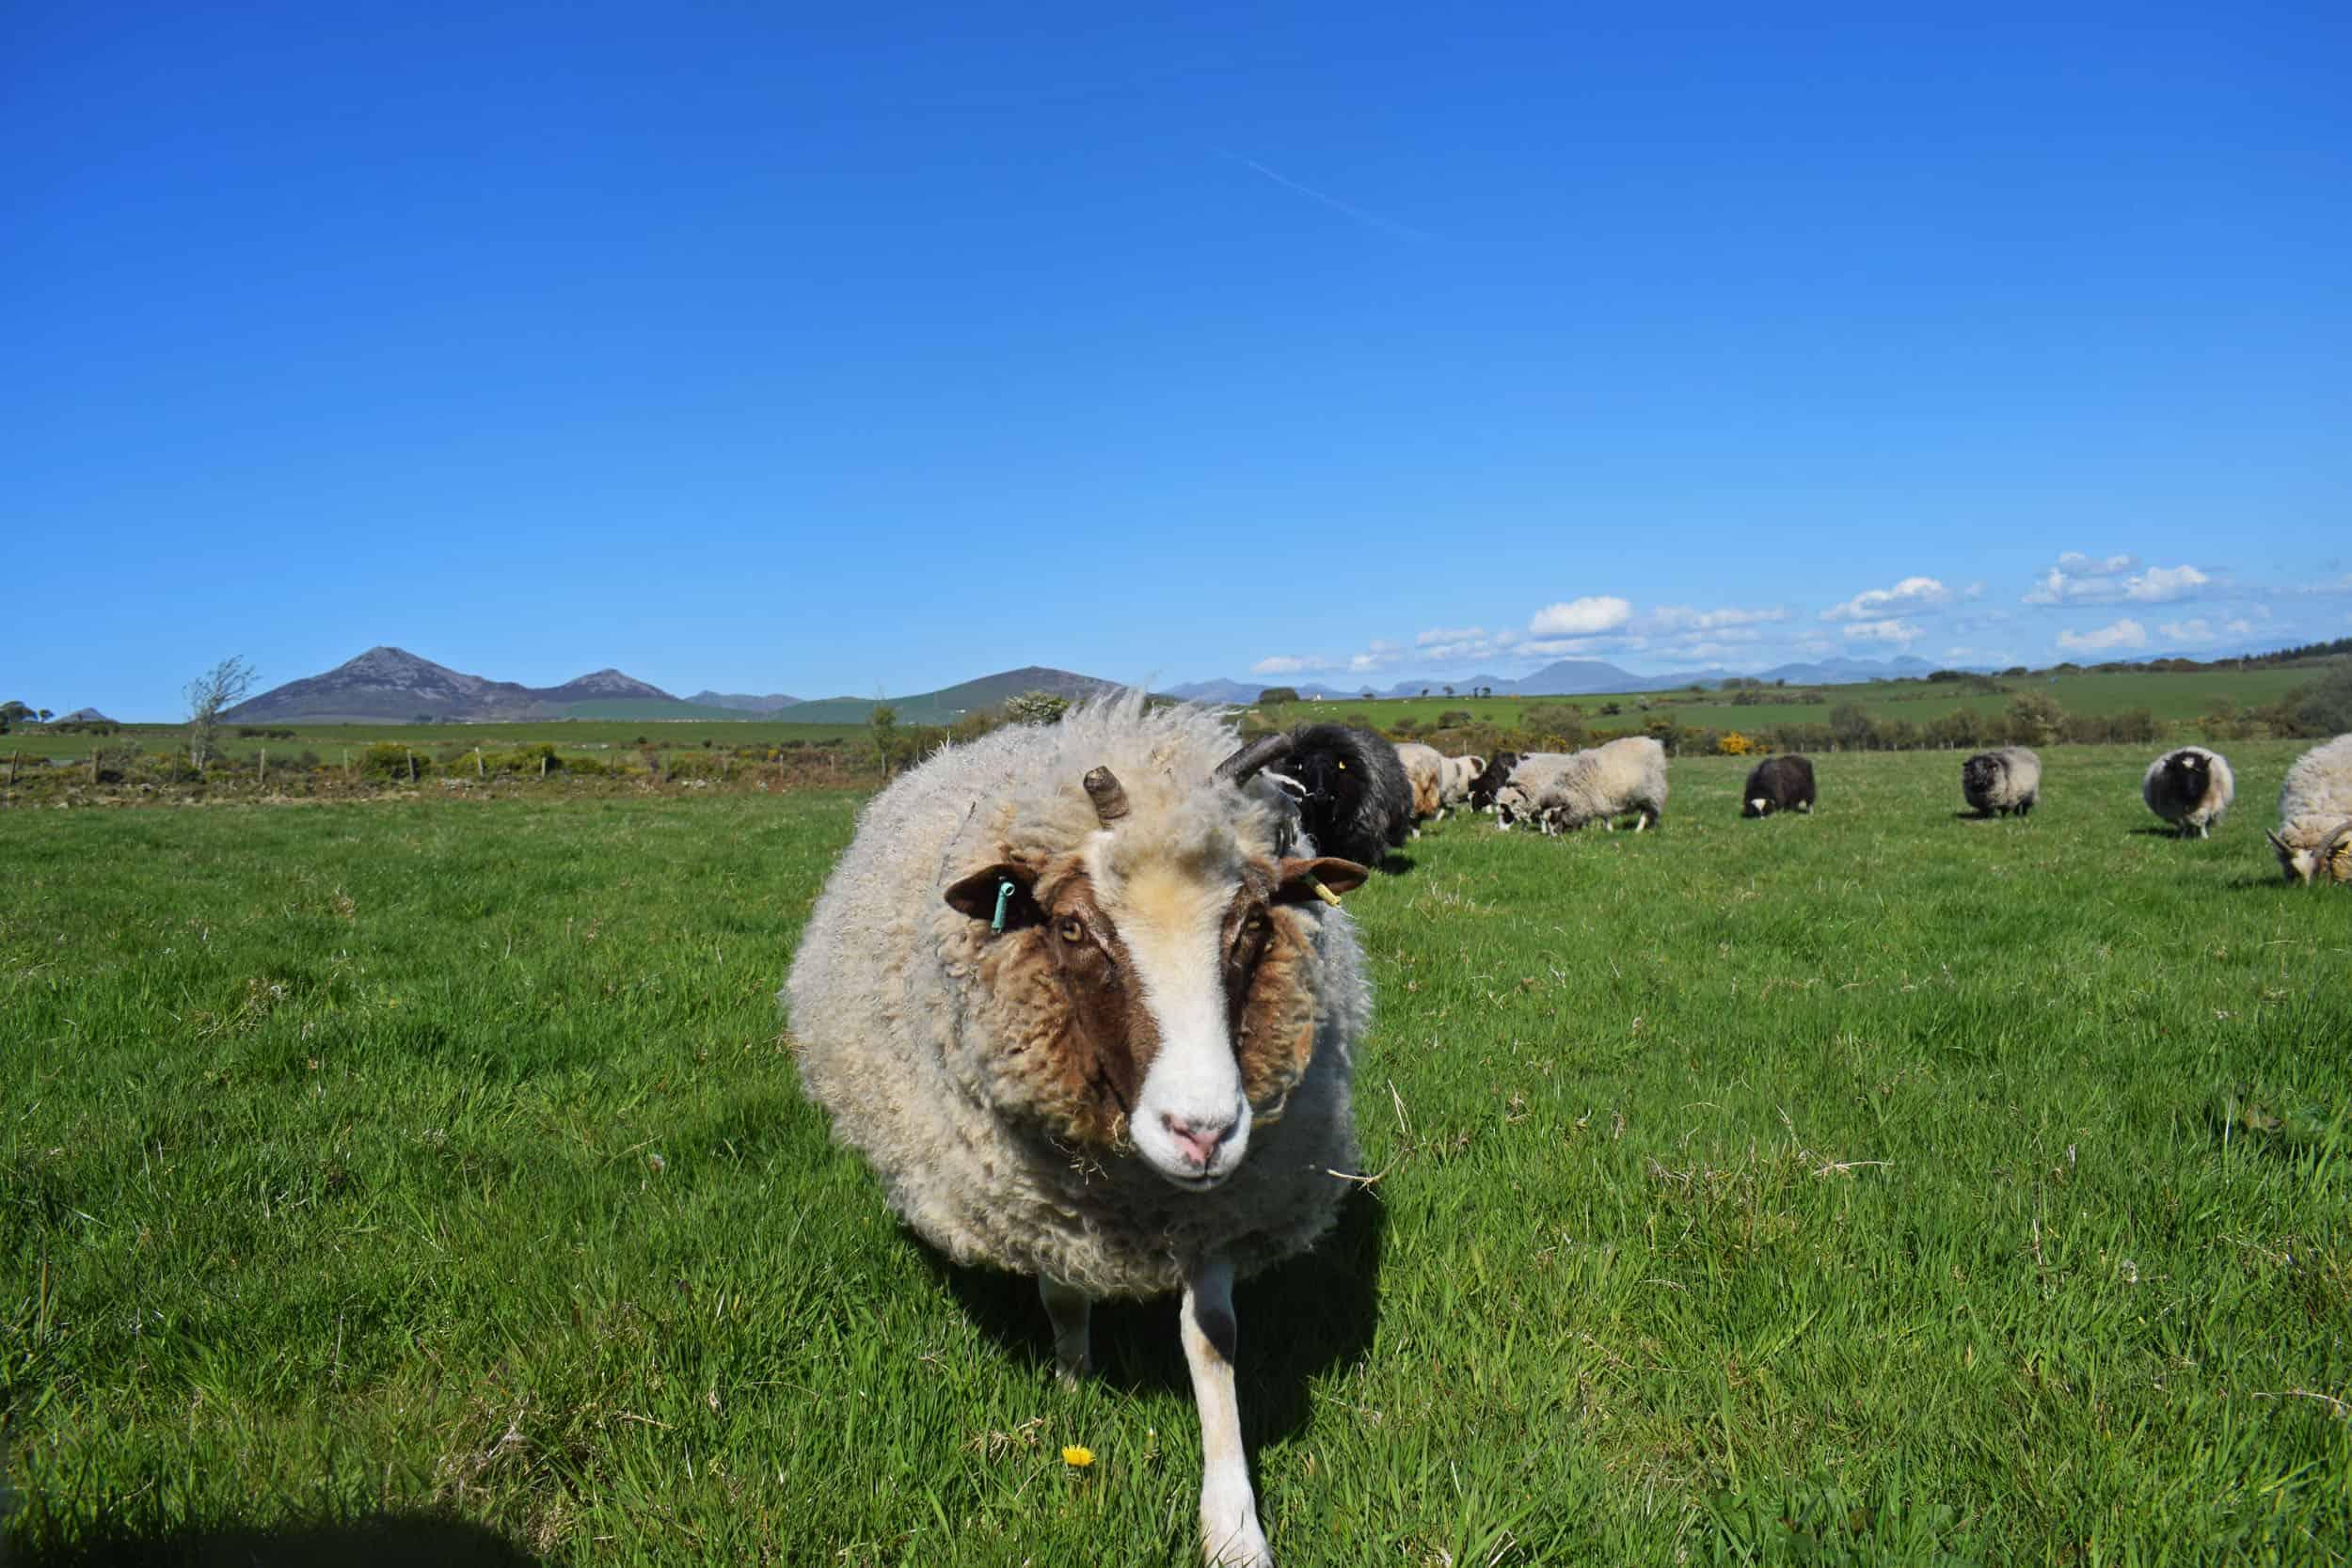 Muffn patchwork sheep moorit brown spotted jacob sheep shetland sheep 2018